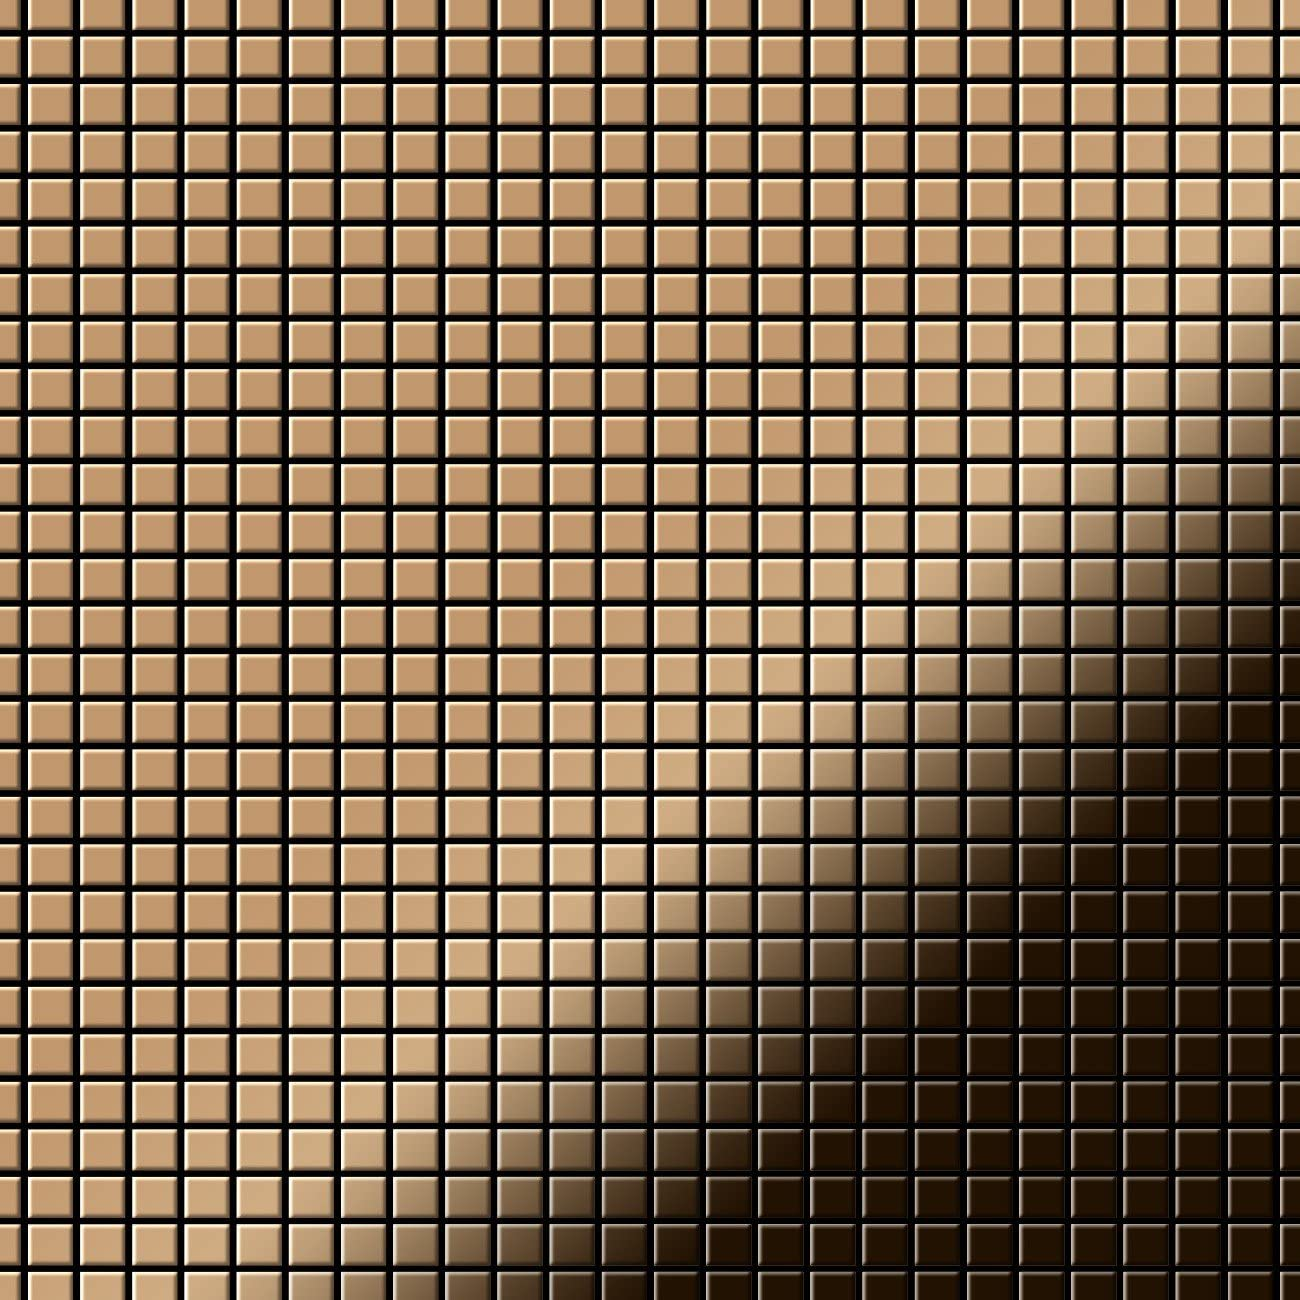 Mosaic Tile massiv Metal Titanium Amber Mirror Copper 1.6mm Thick ALLOY Glomesh-Ti-AM